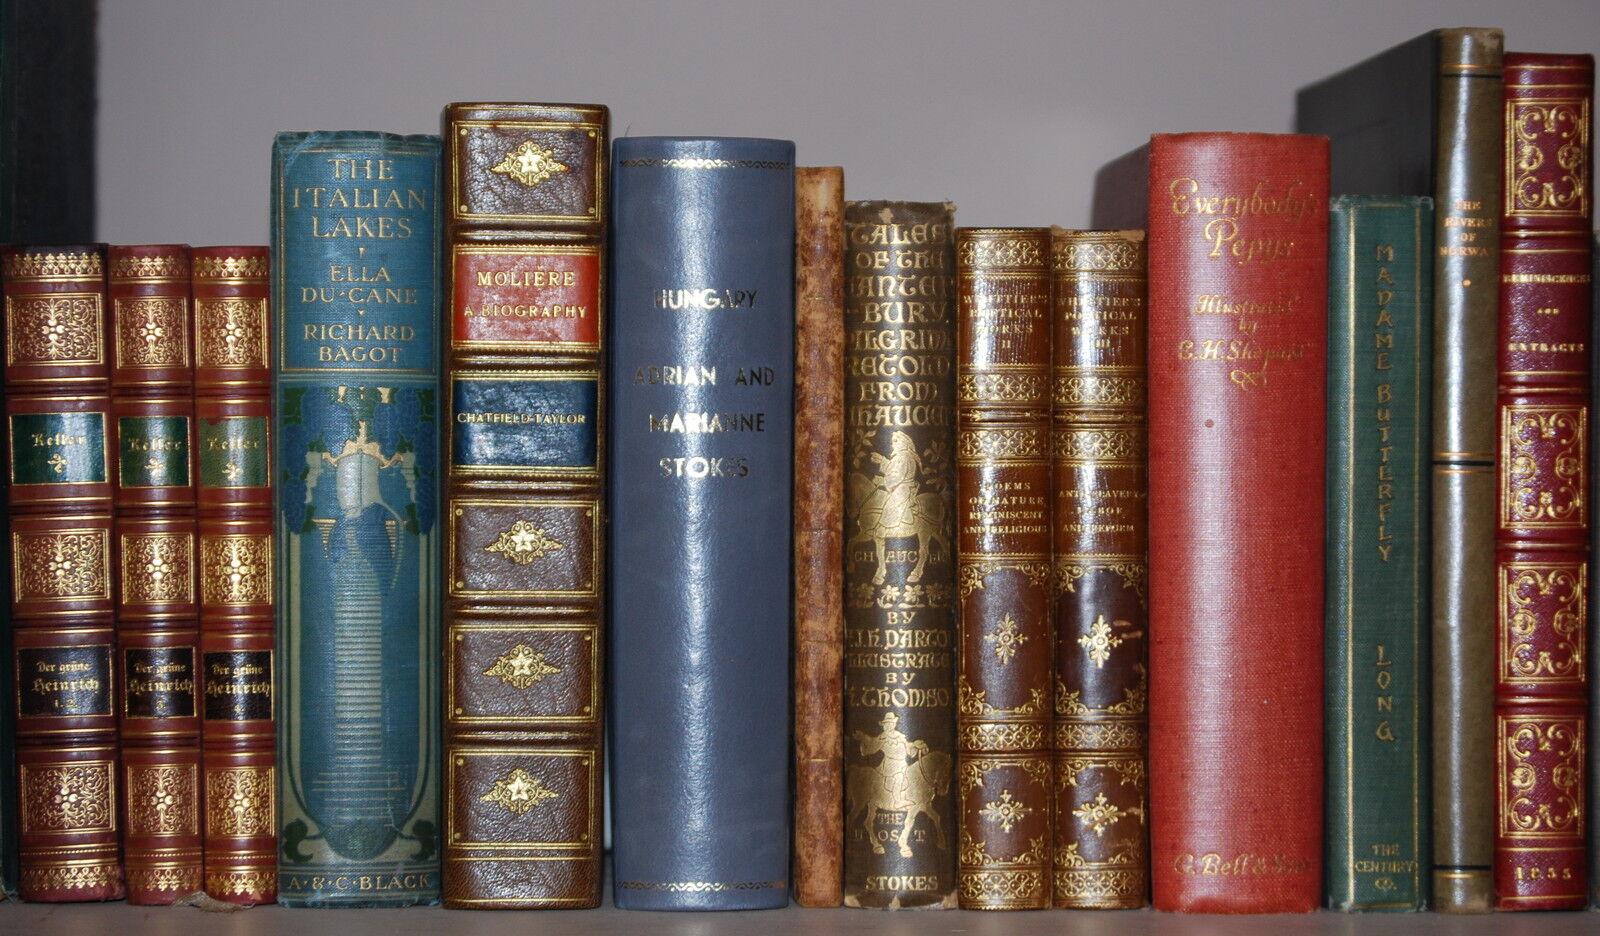 Ed's Bookshelf